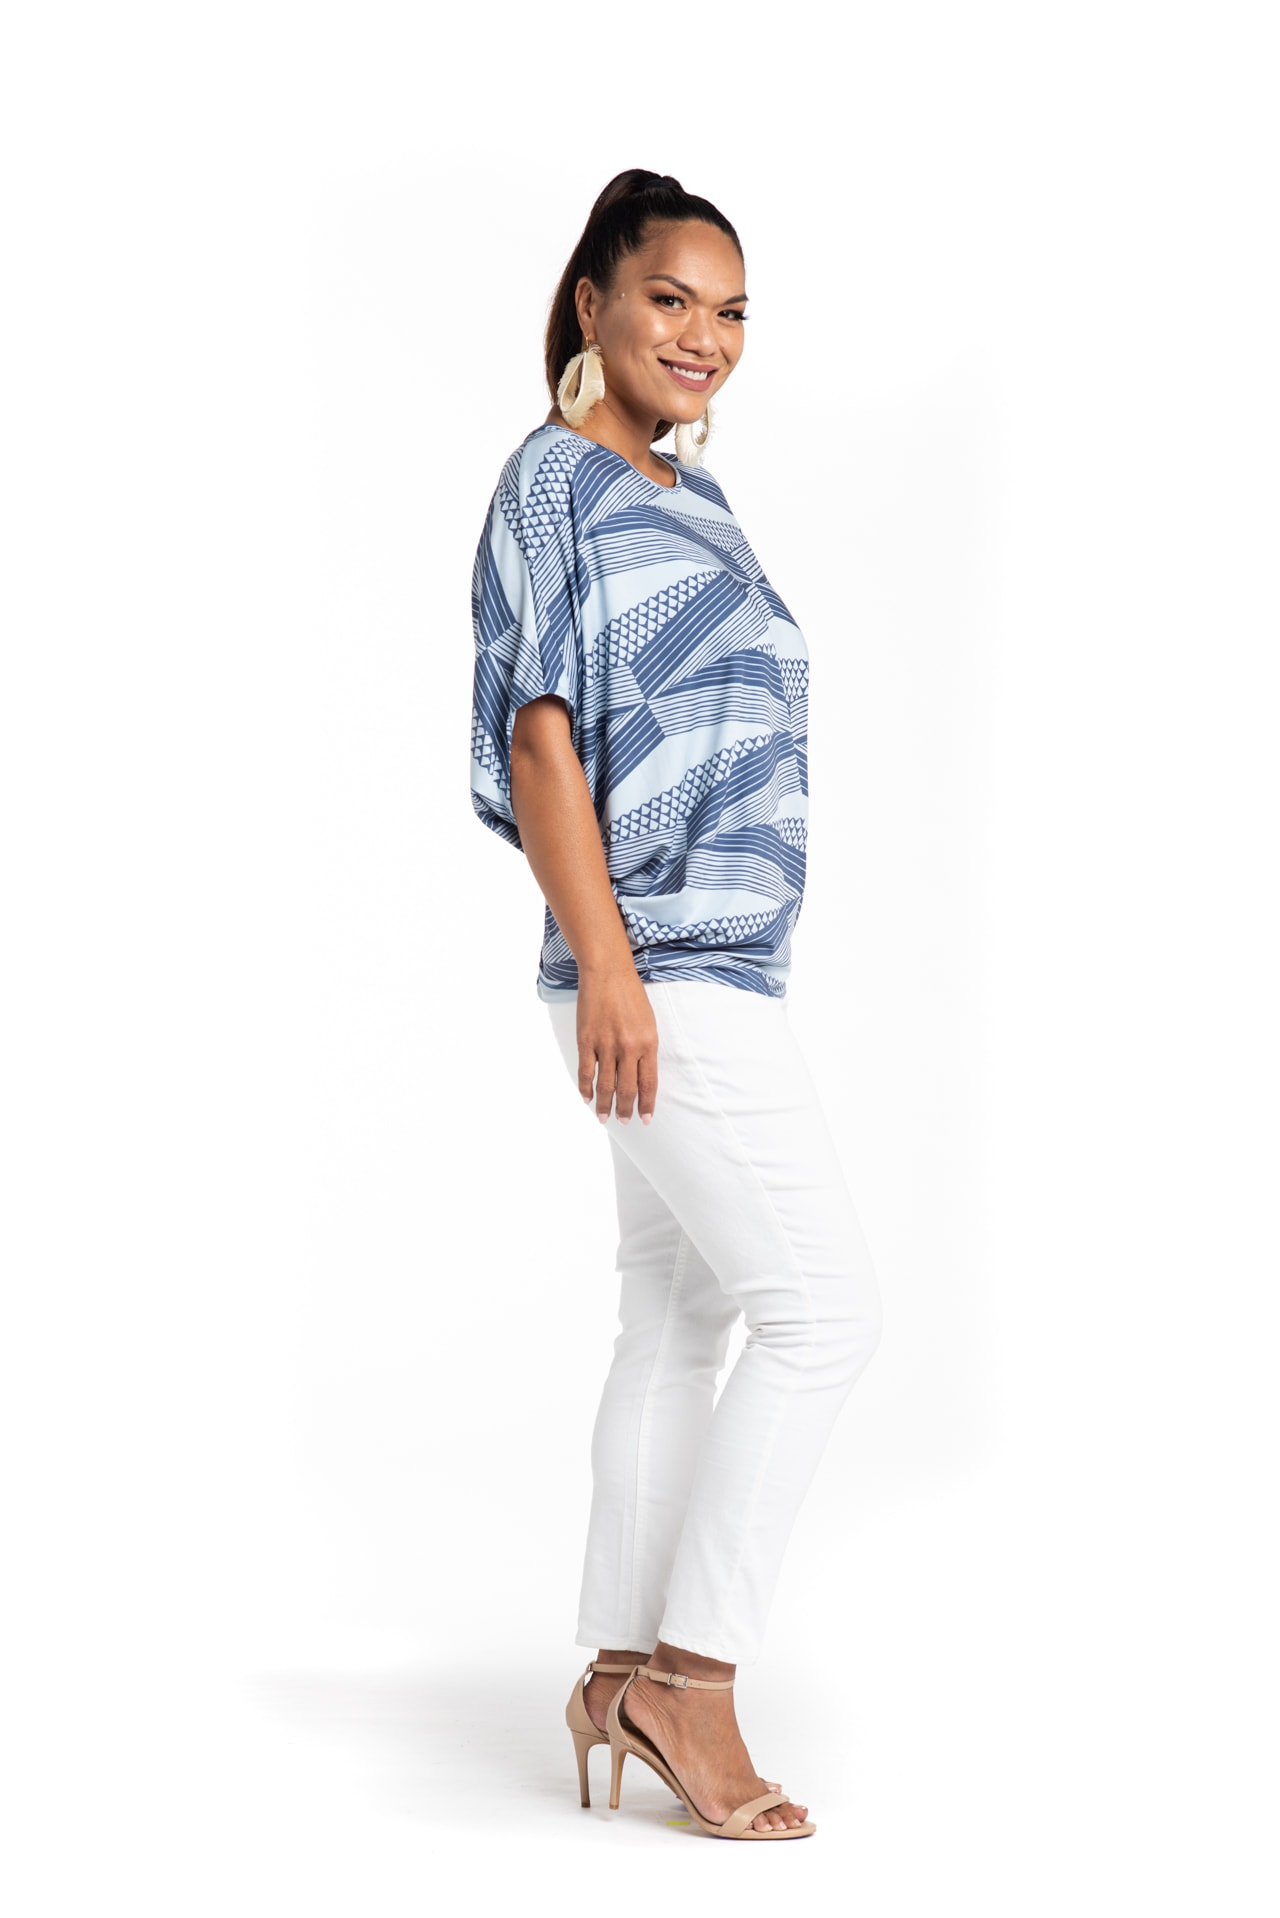 Model wearing Mahalo Nui Shirt - Side View